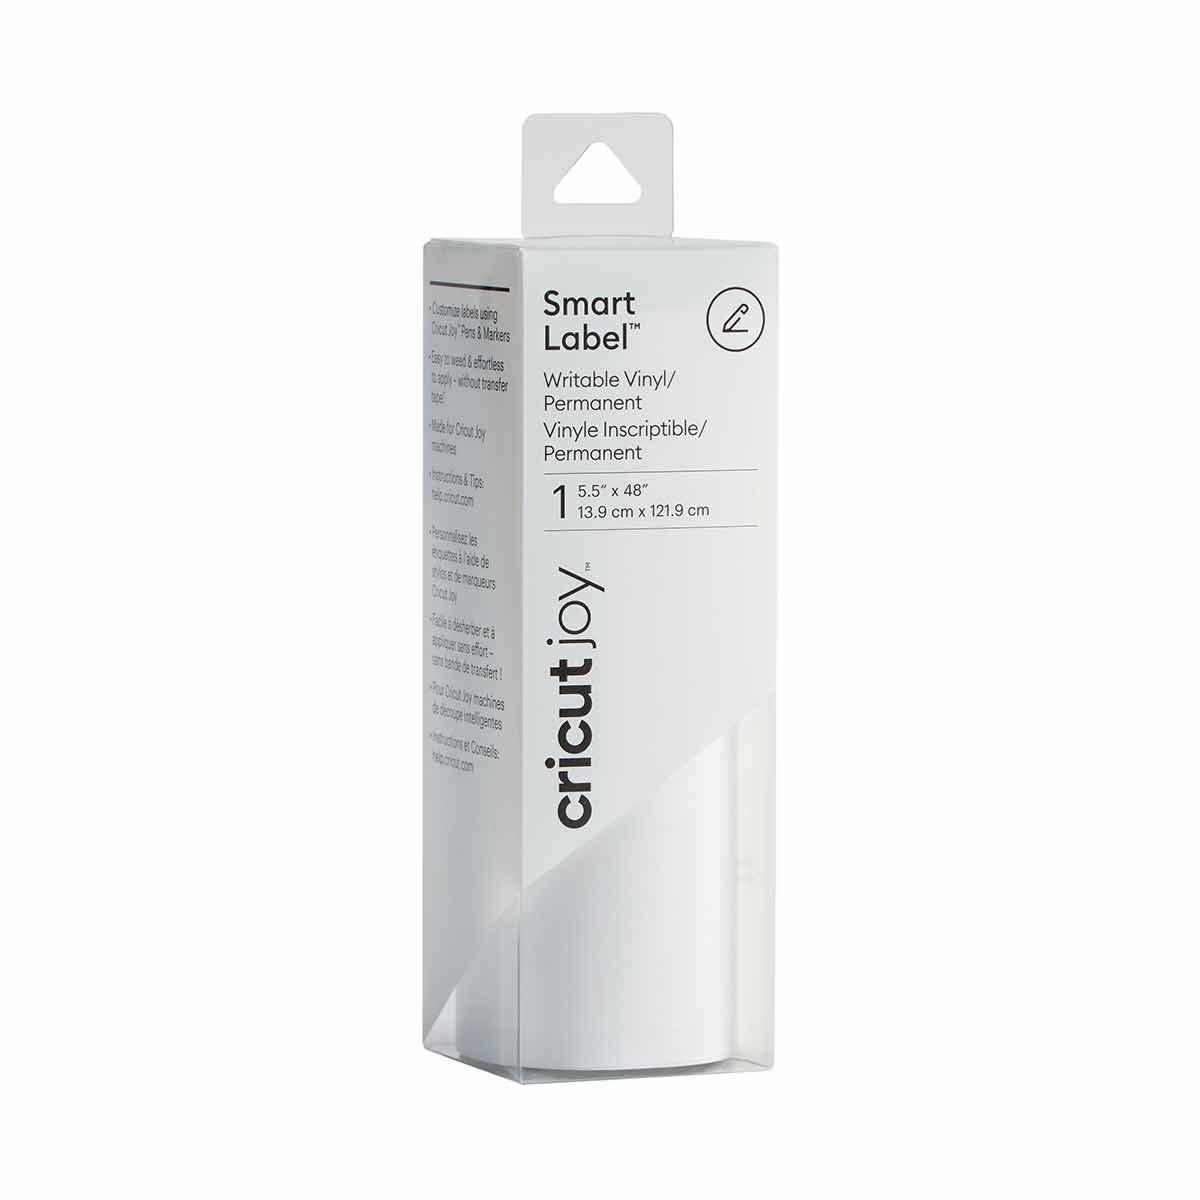 Cricut Joy Smart Labels 5.5x48inch